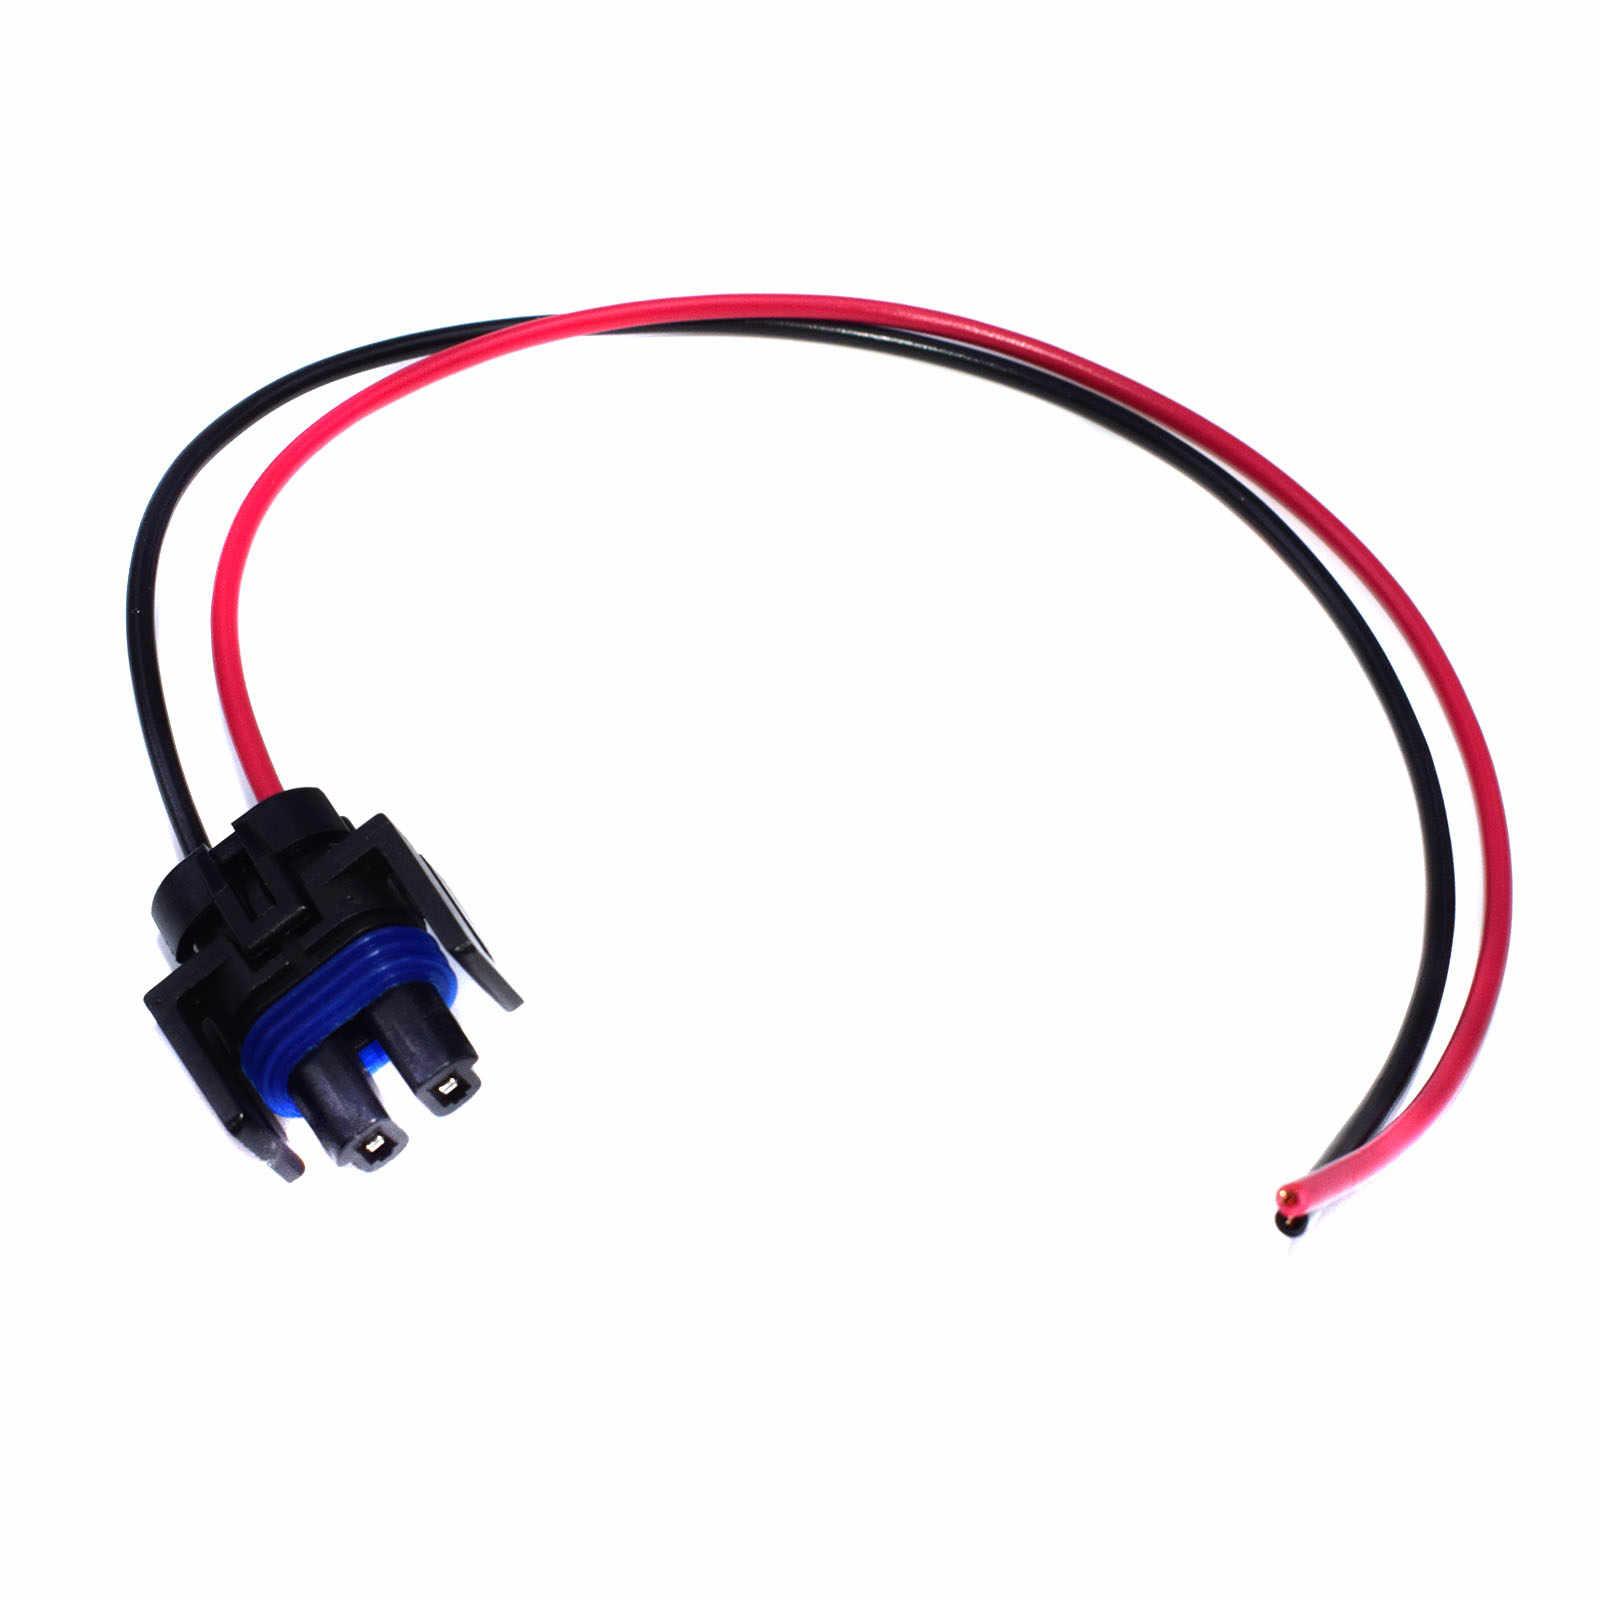 WOLFIGO New Compressor Connector Pigtail Wiring Plug 12101937 PT209 88862230 For Buick Chevrolet C1500 GMC Pontiac